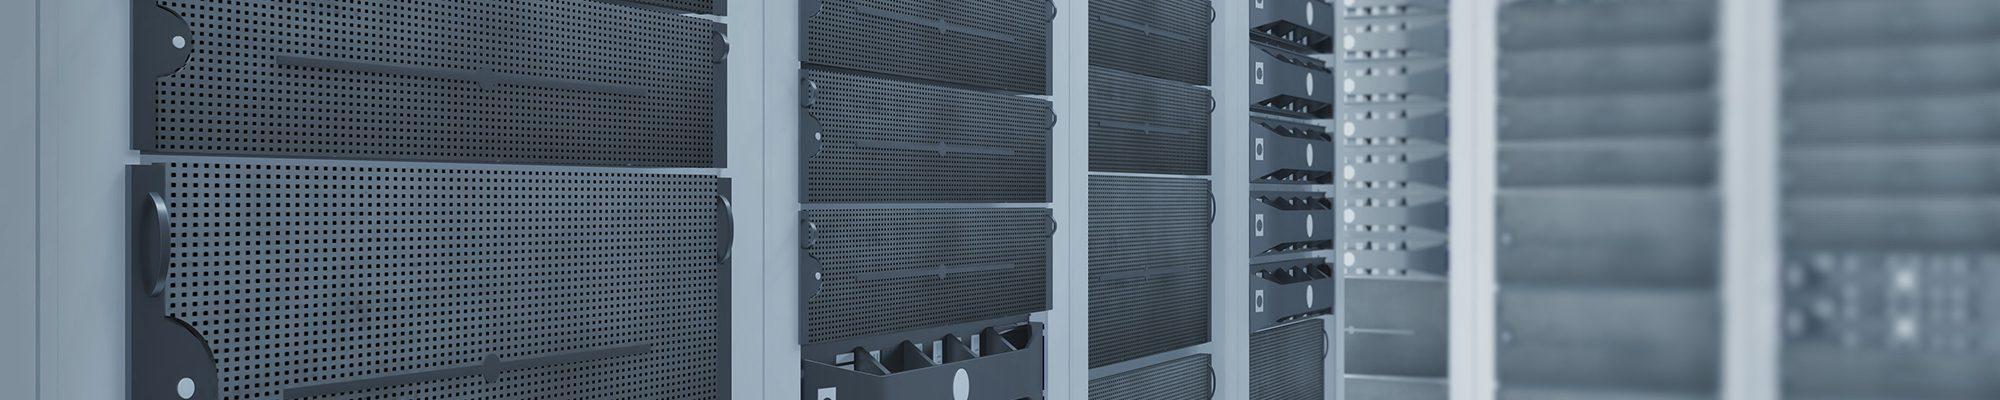 network-server-room-PW46XSN-okh2kuhewq2vimy0e56fb522u35vax25jafjoytf34